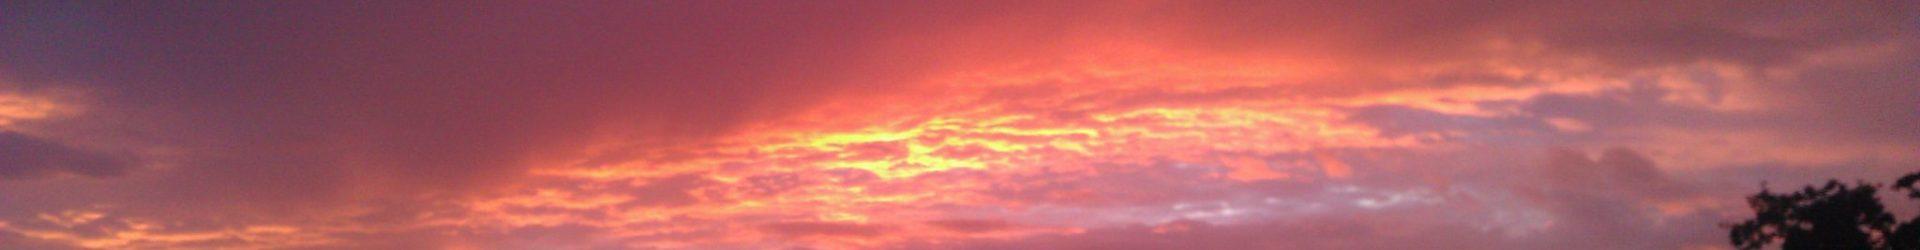 Sonnenuntergang 09.07.2011